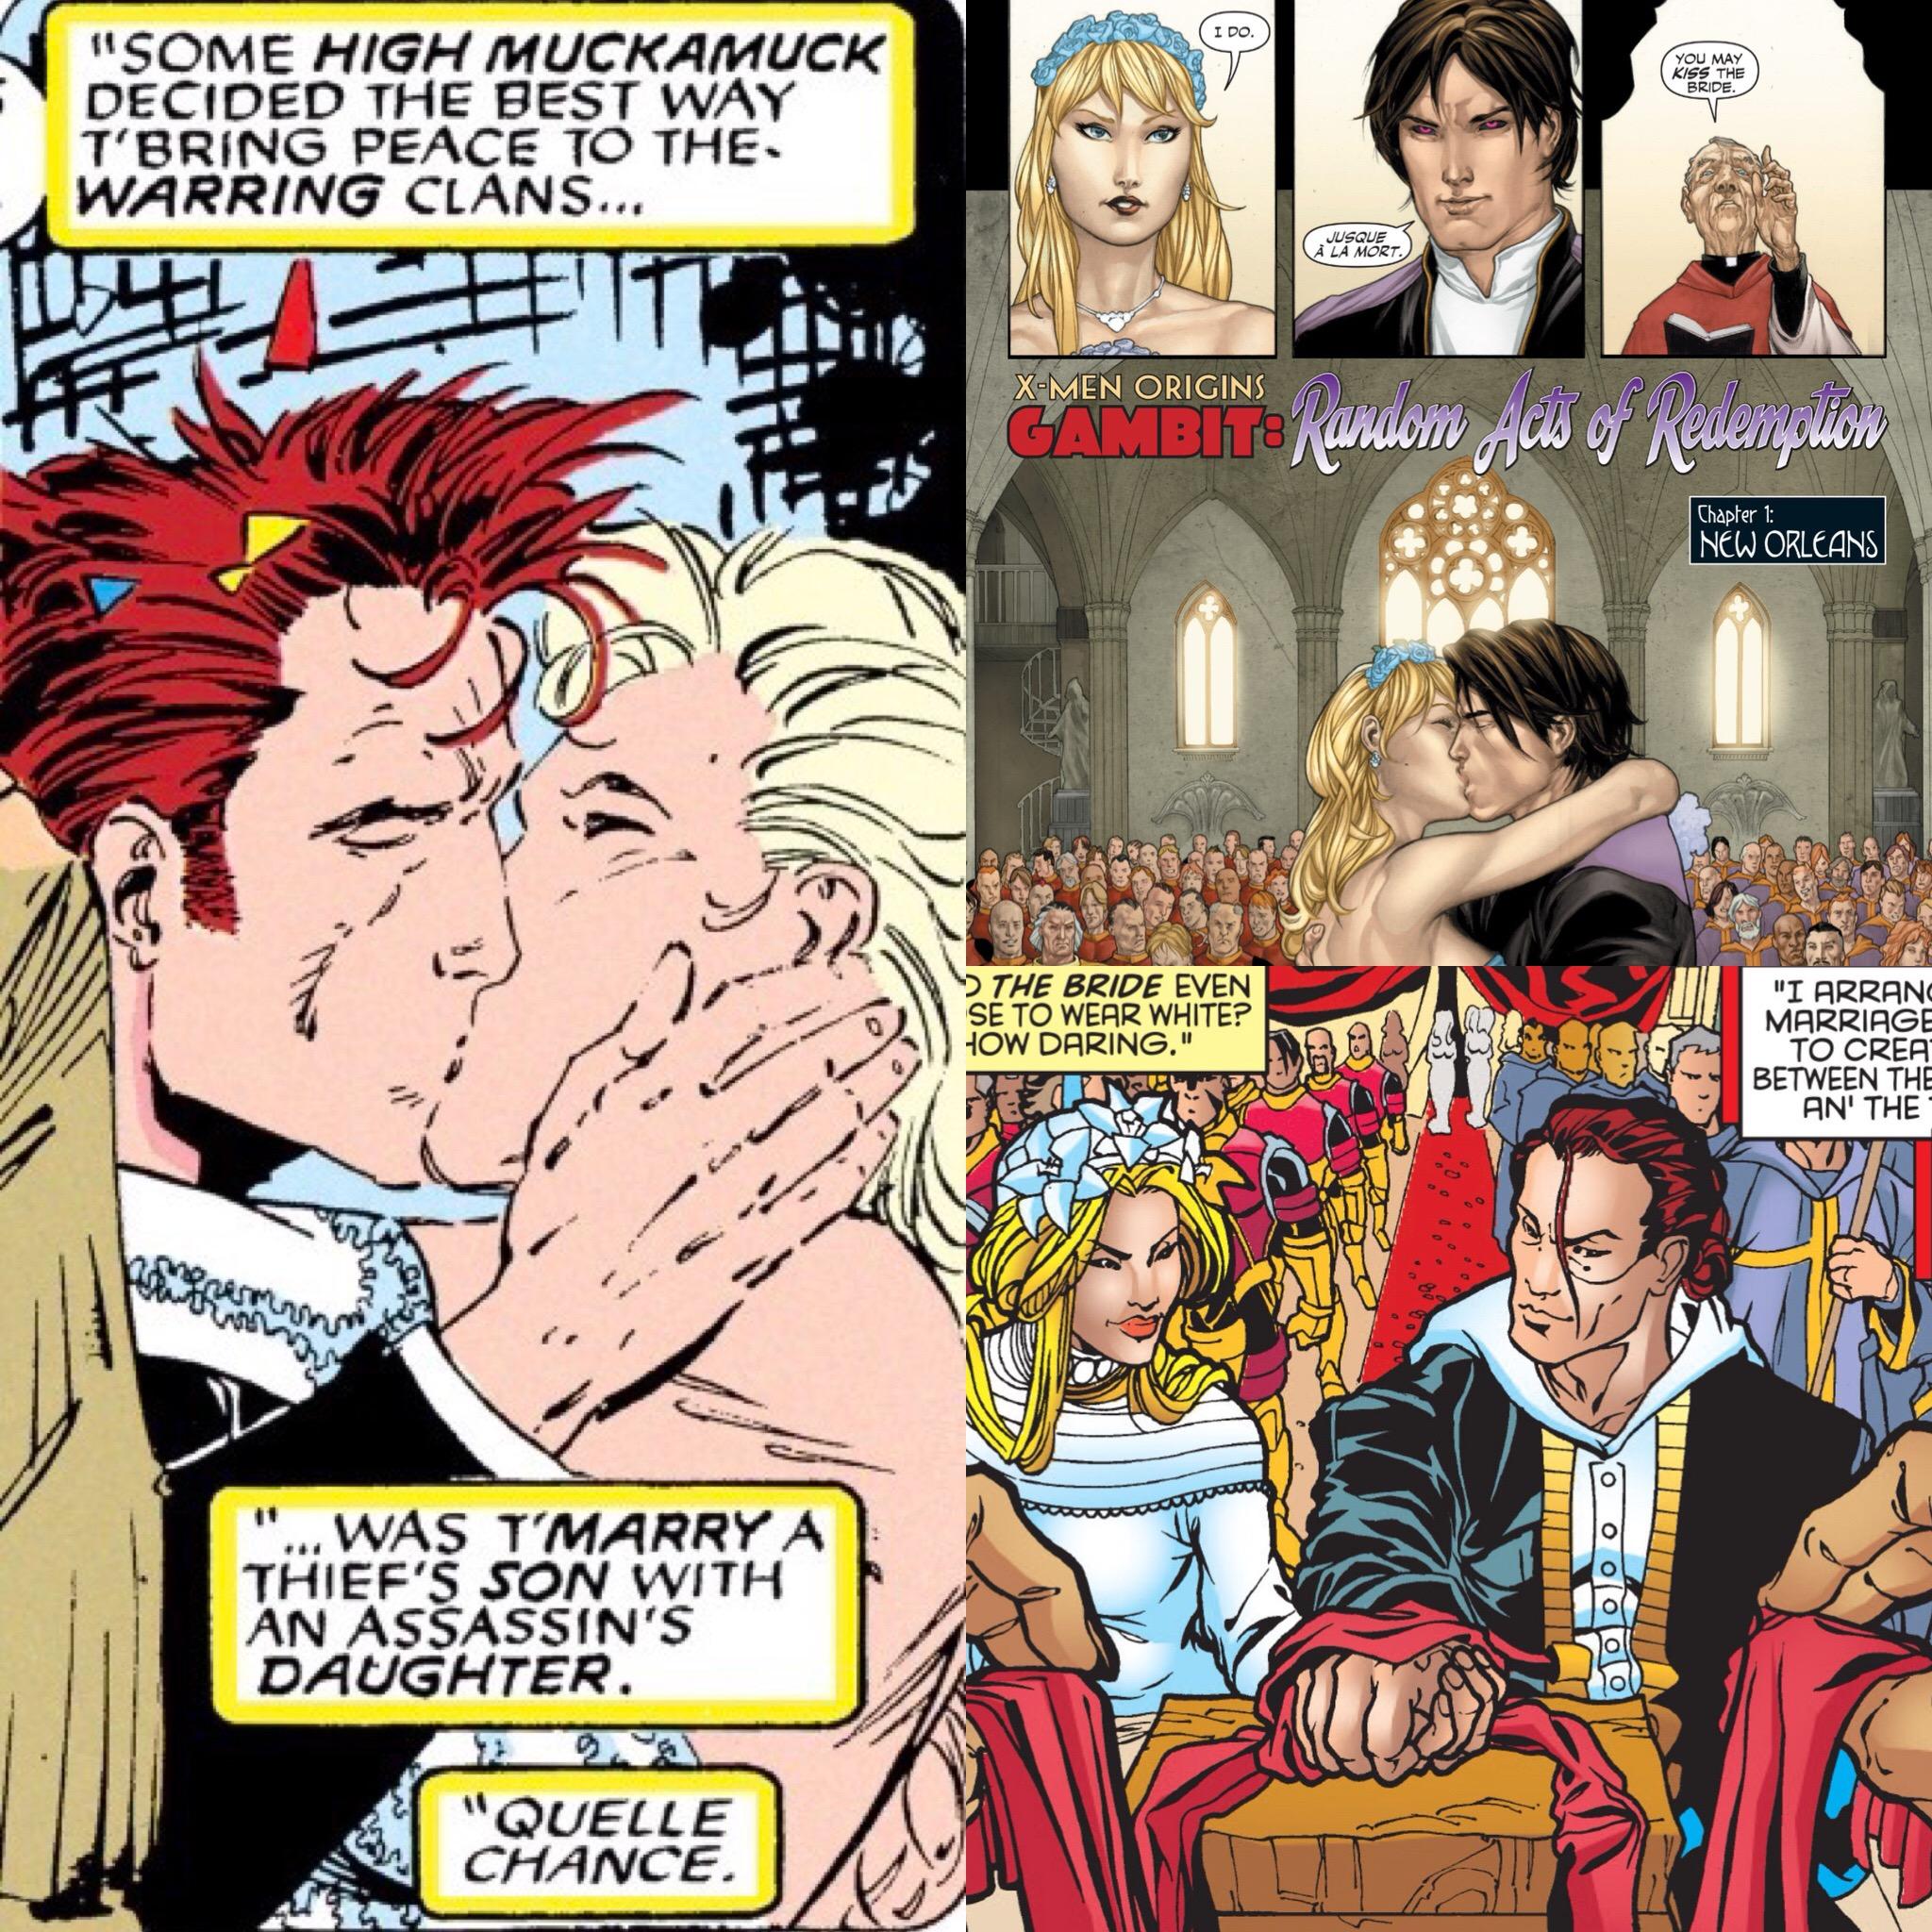 Remy Marries Bella Donna Boudreaux ( X-men #8 ;  X-Men Origins: Gambit ;  Gambit Vol.3 #1 )